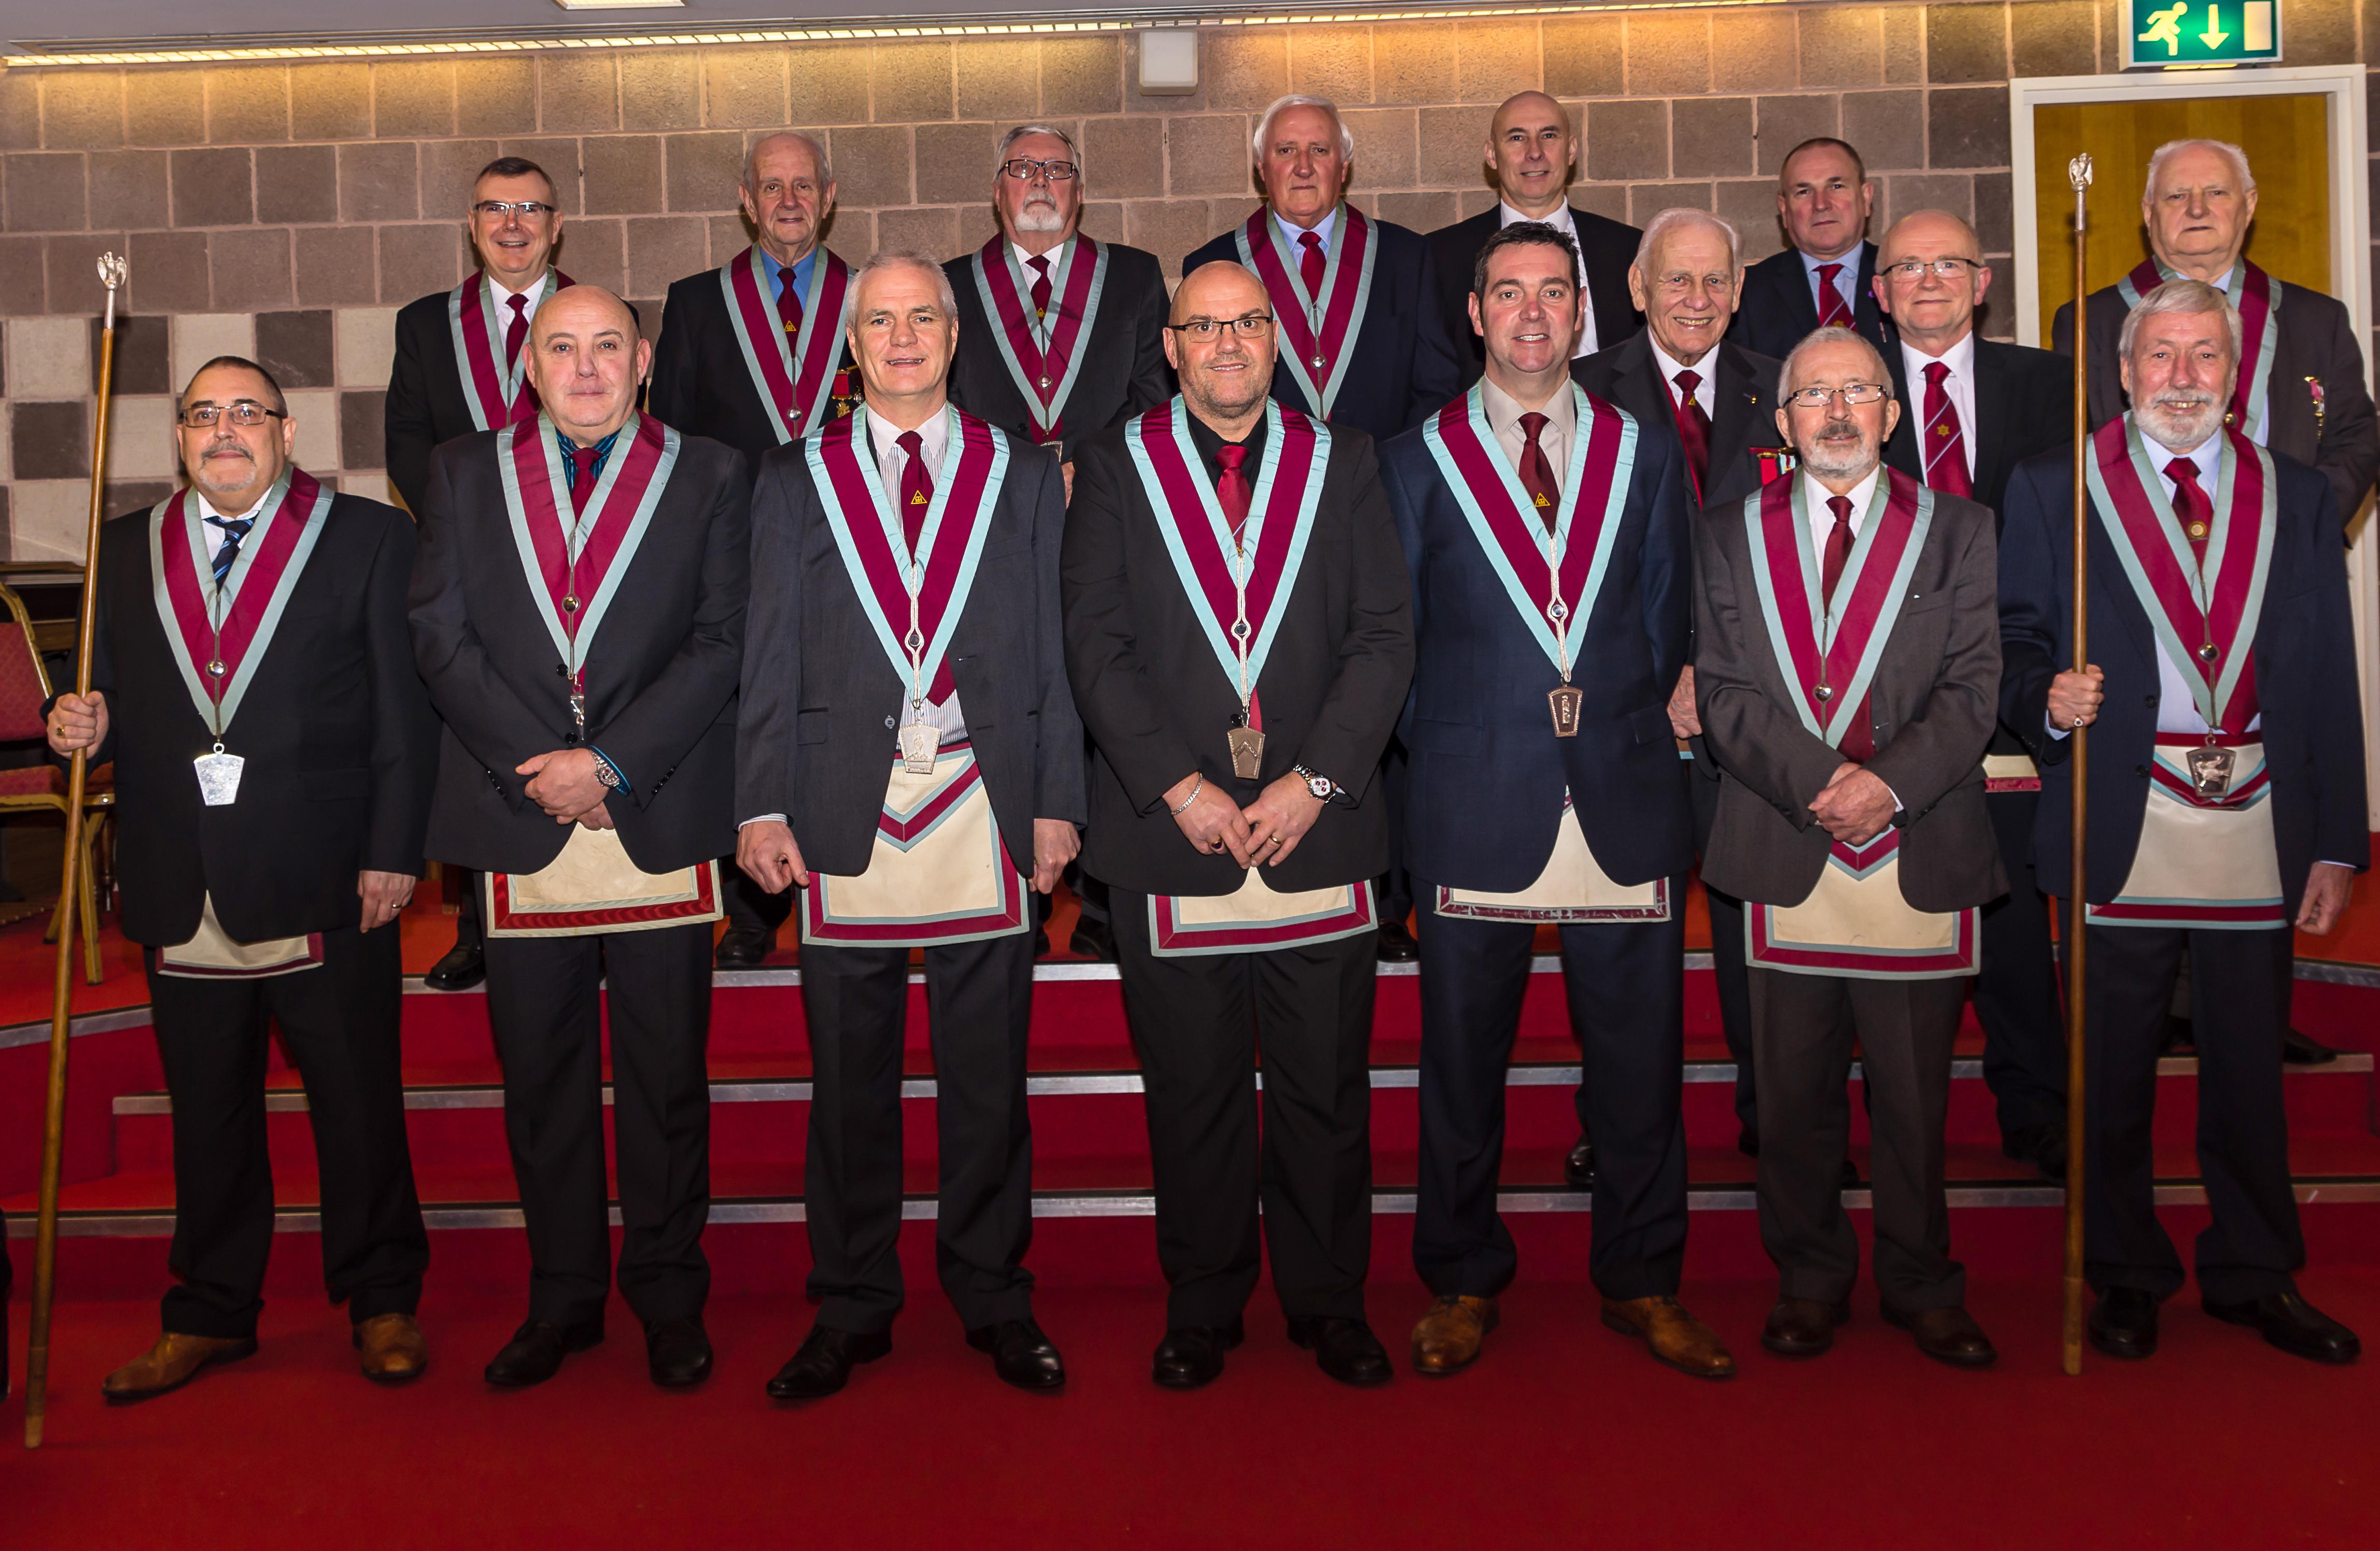 Abbey180 Mark Master Masons officers